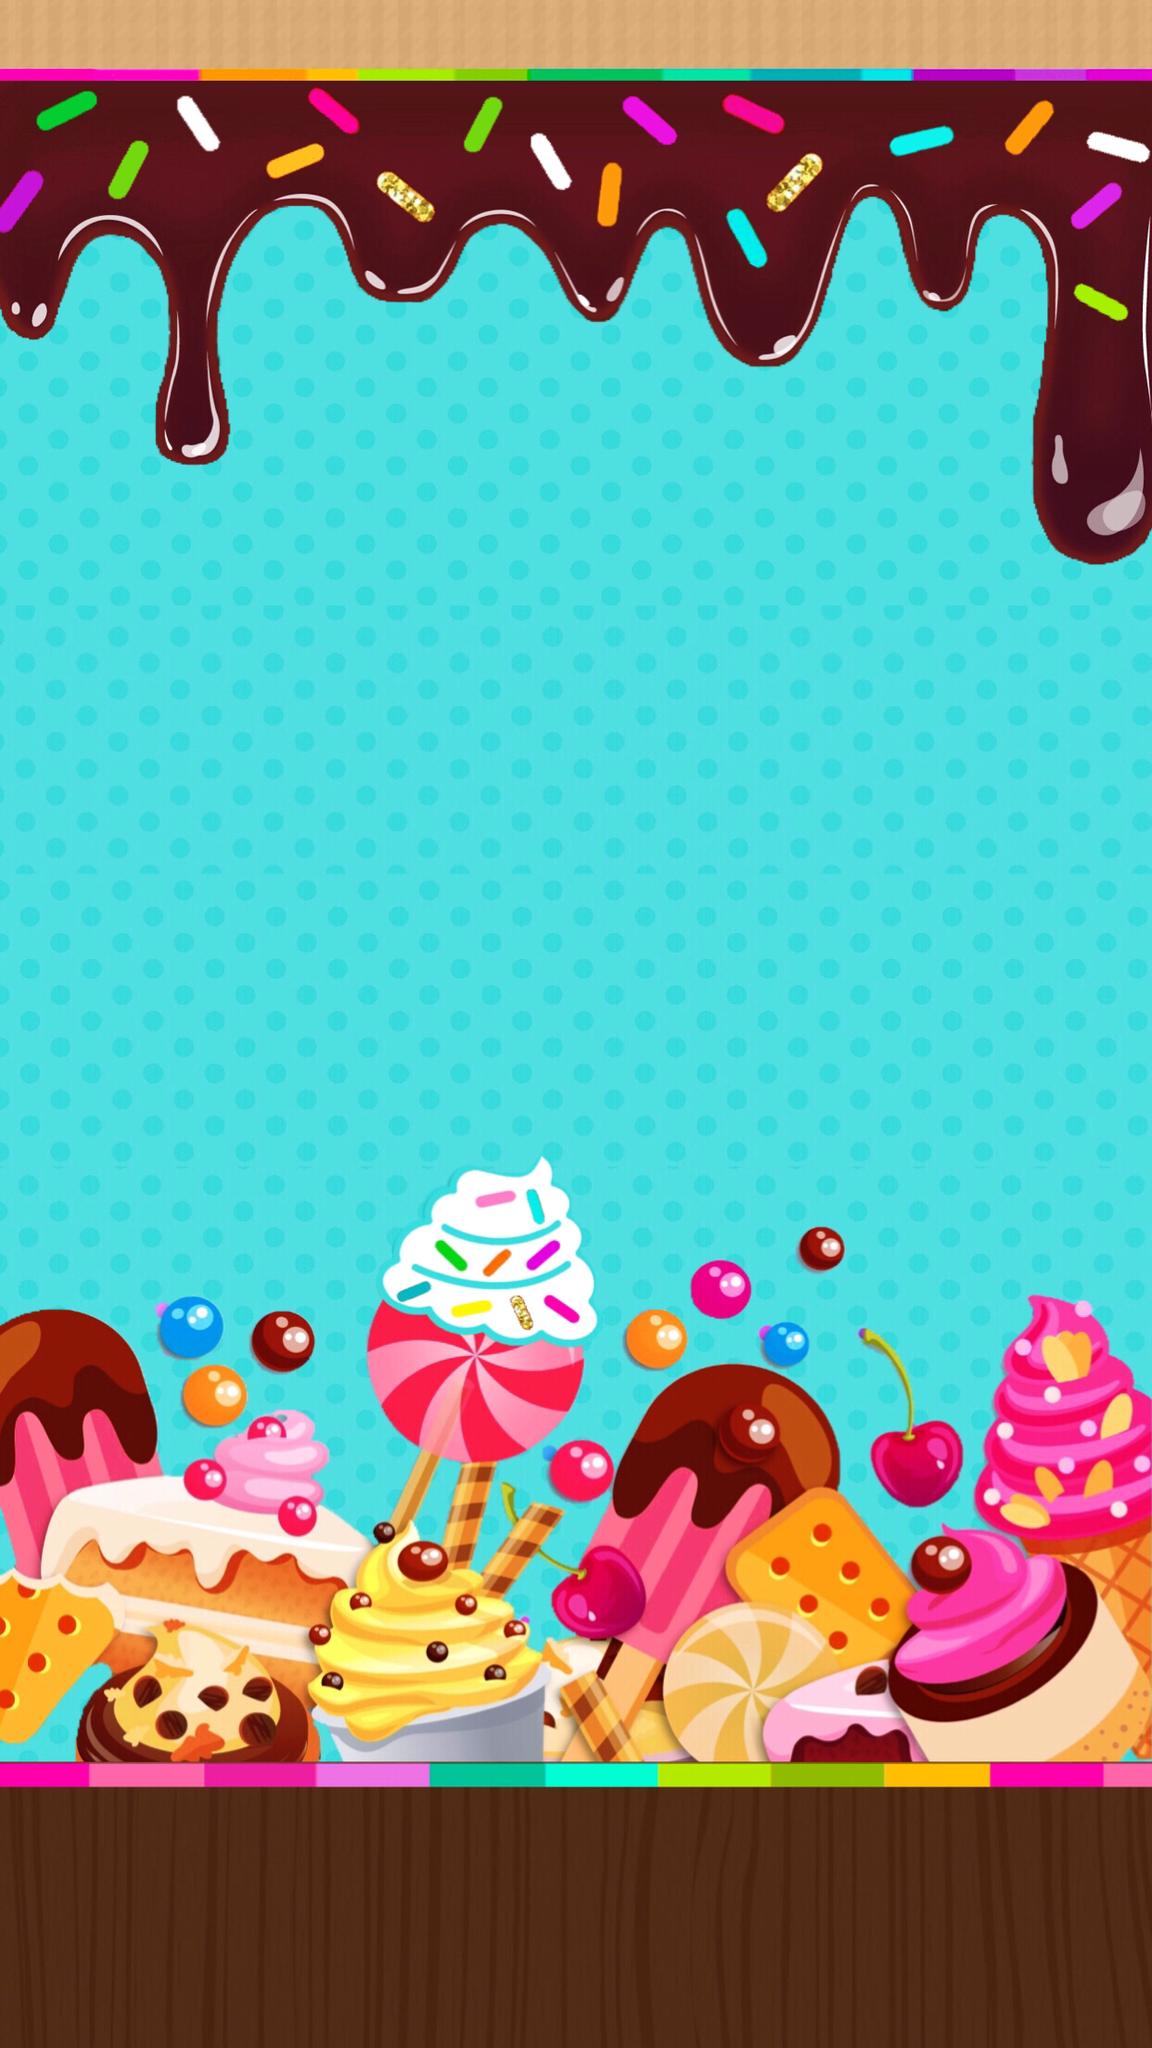 Dropbox Sweet Treats Wallpaper In 2019 Cupcakes